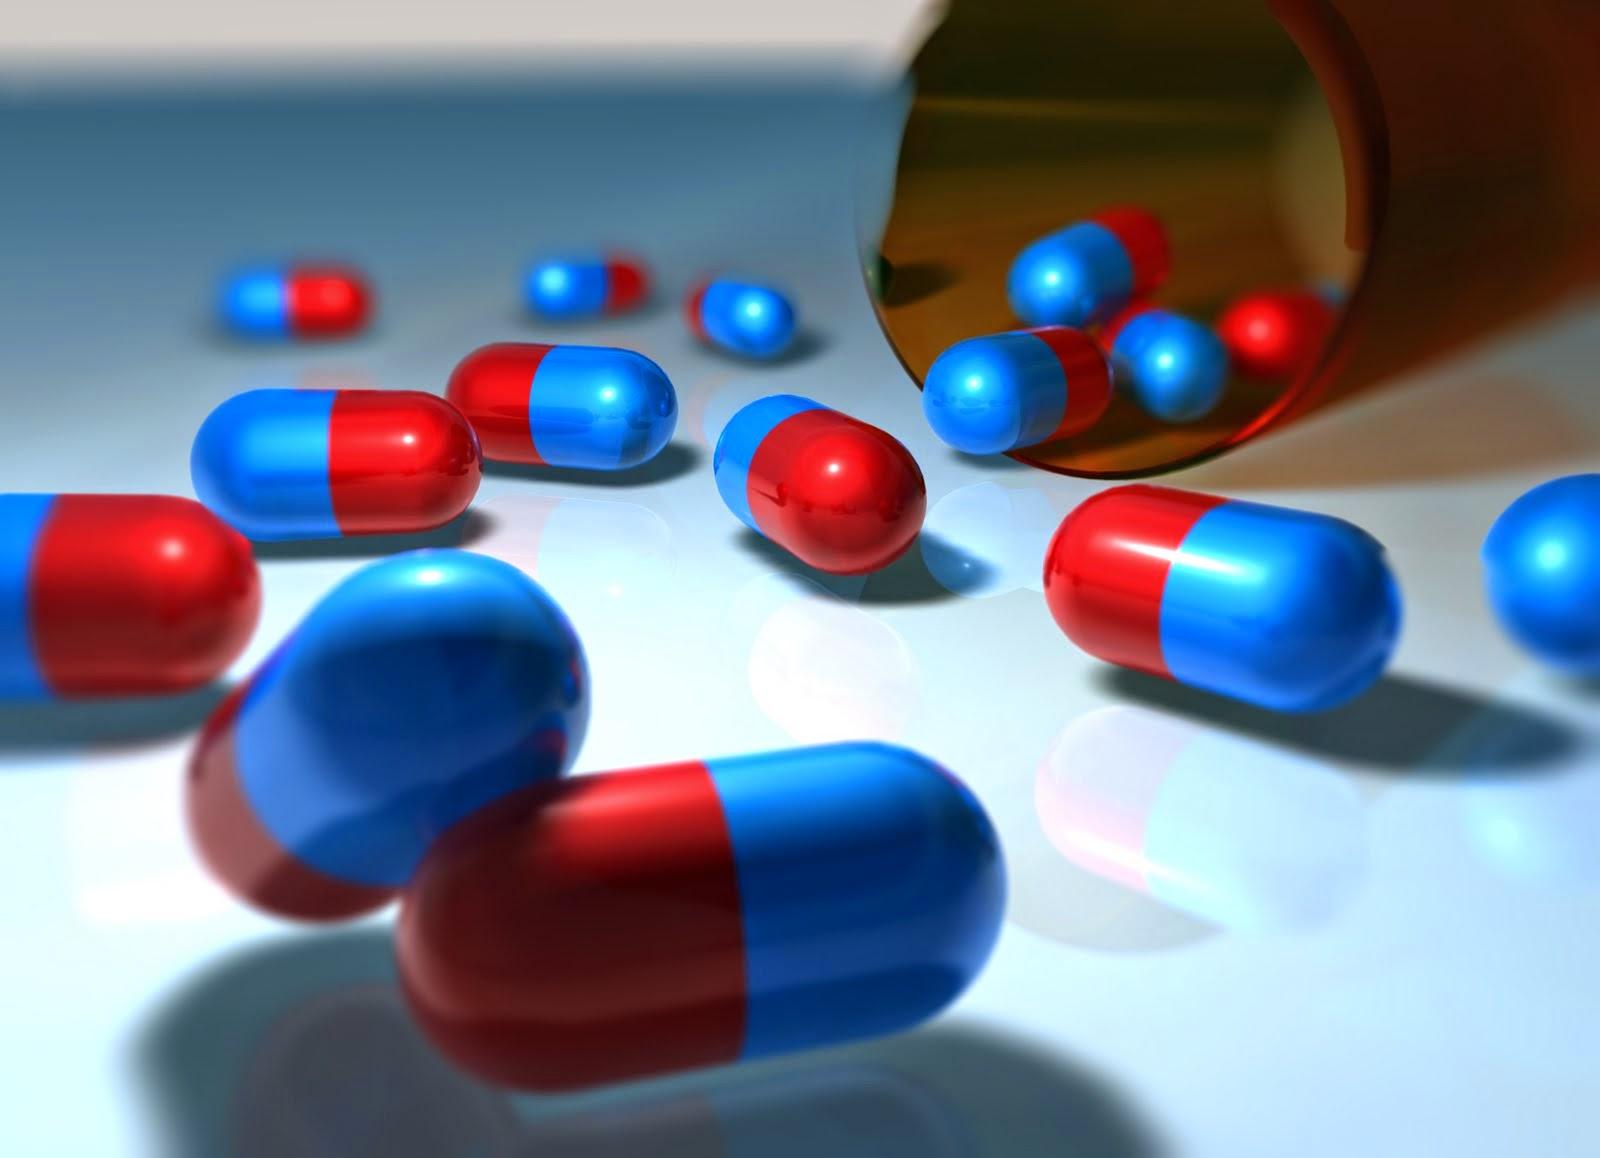 prendi metformina 850 mg per perdere peso